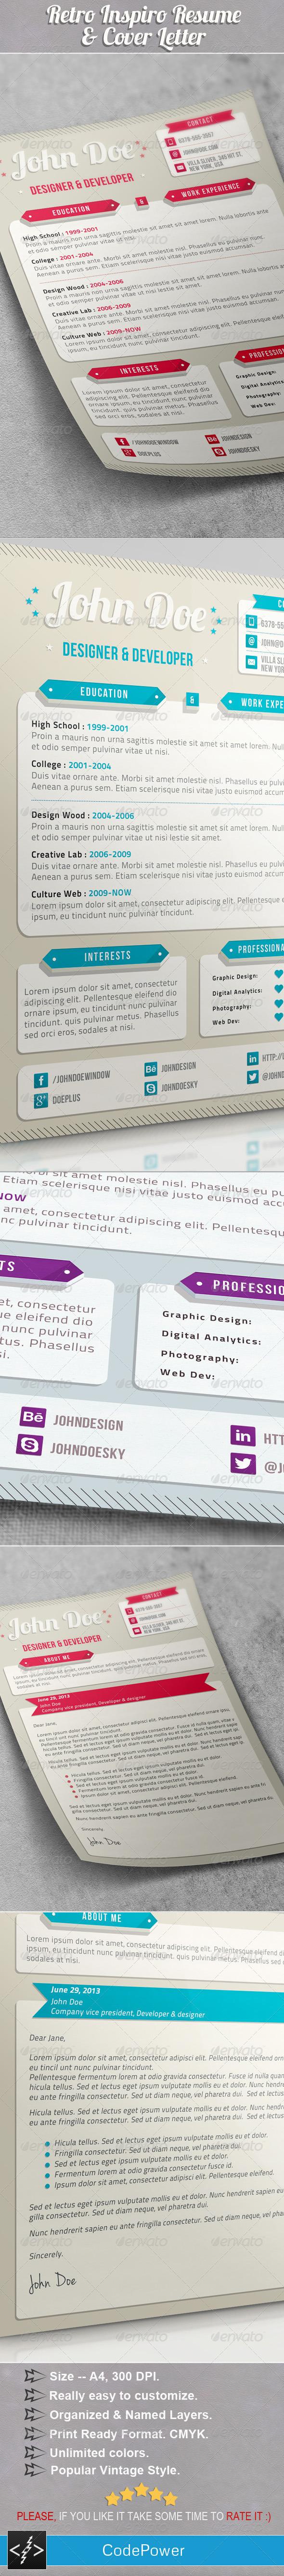 Retro Inspiro Resume & Cover Letter - Resumes Stationery